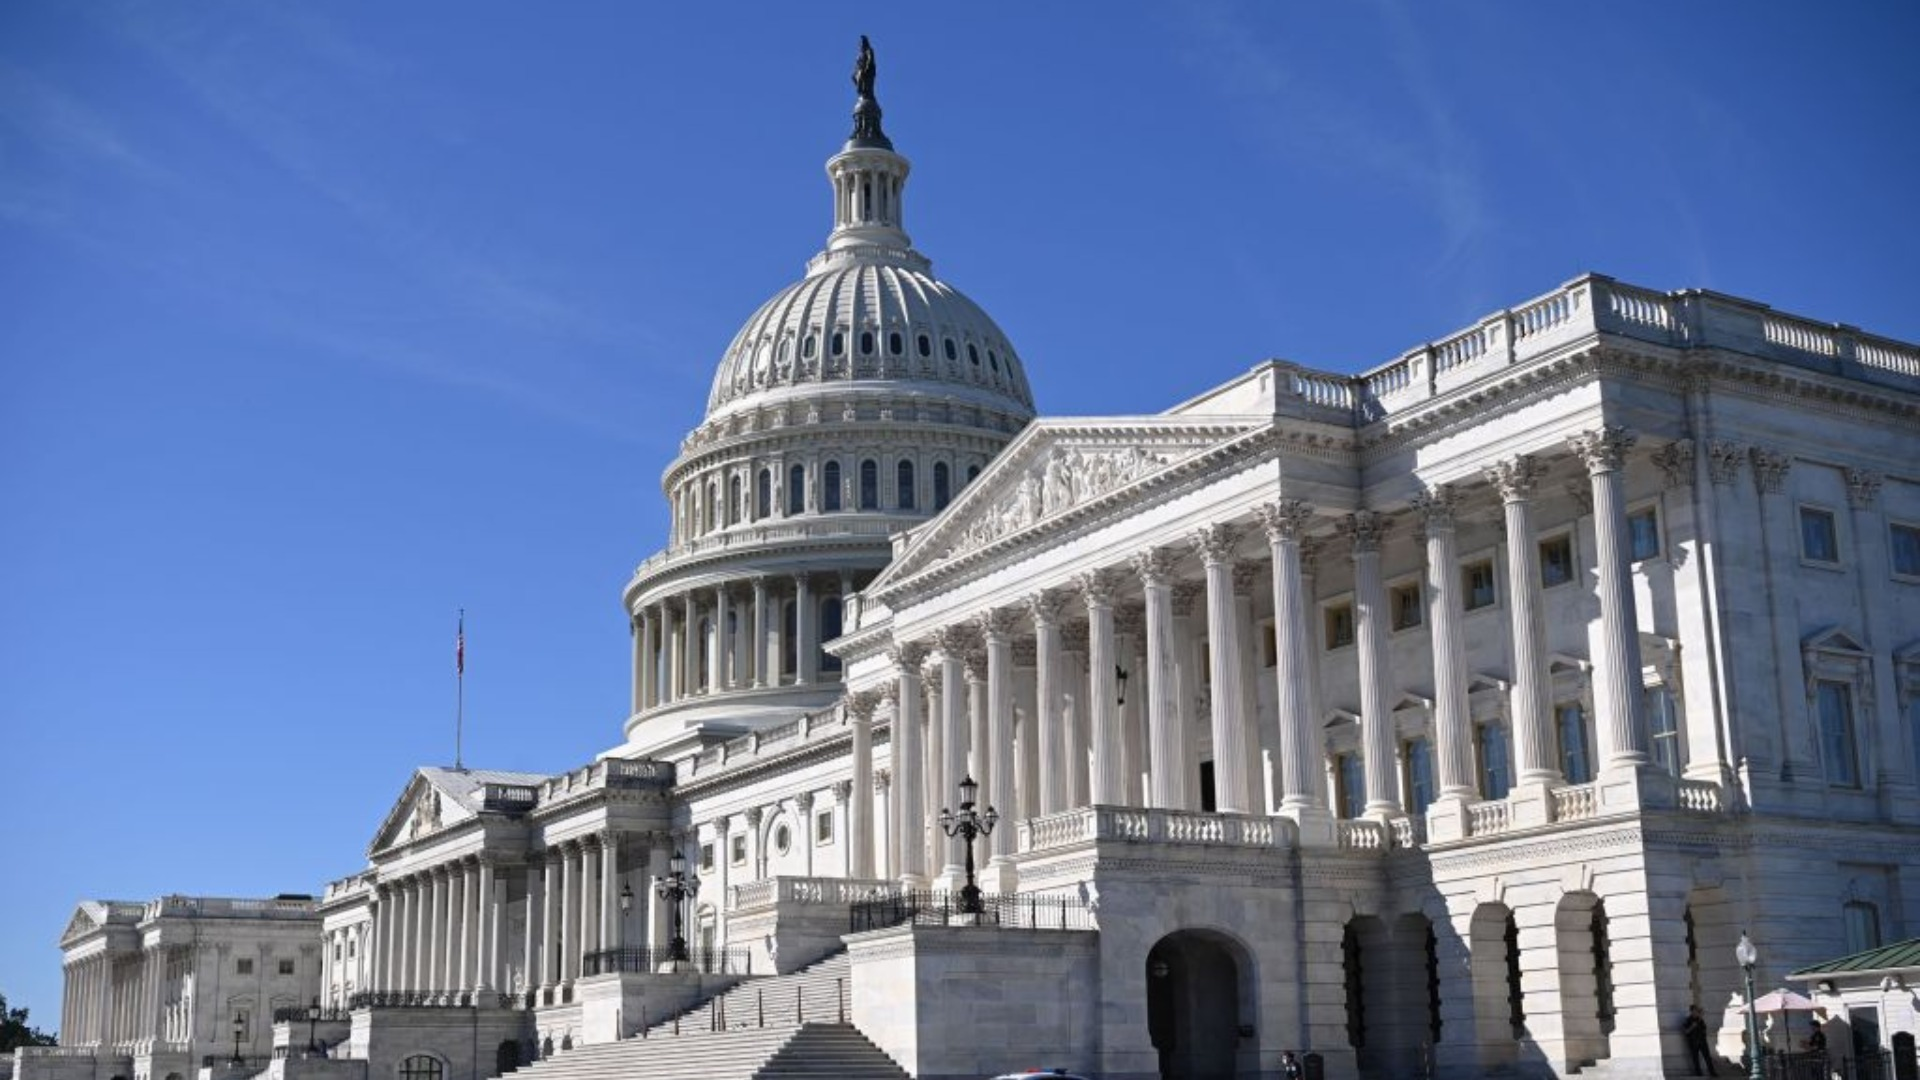 Major votes this week on President Biden's agenda as government shutdown looms